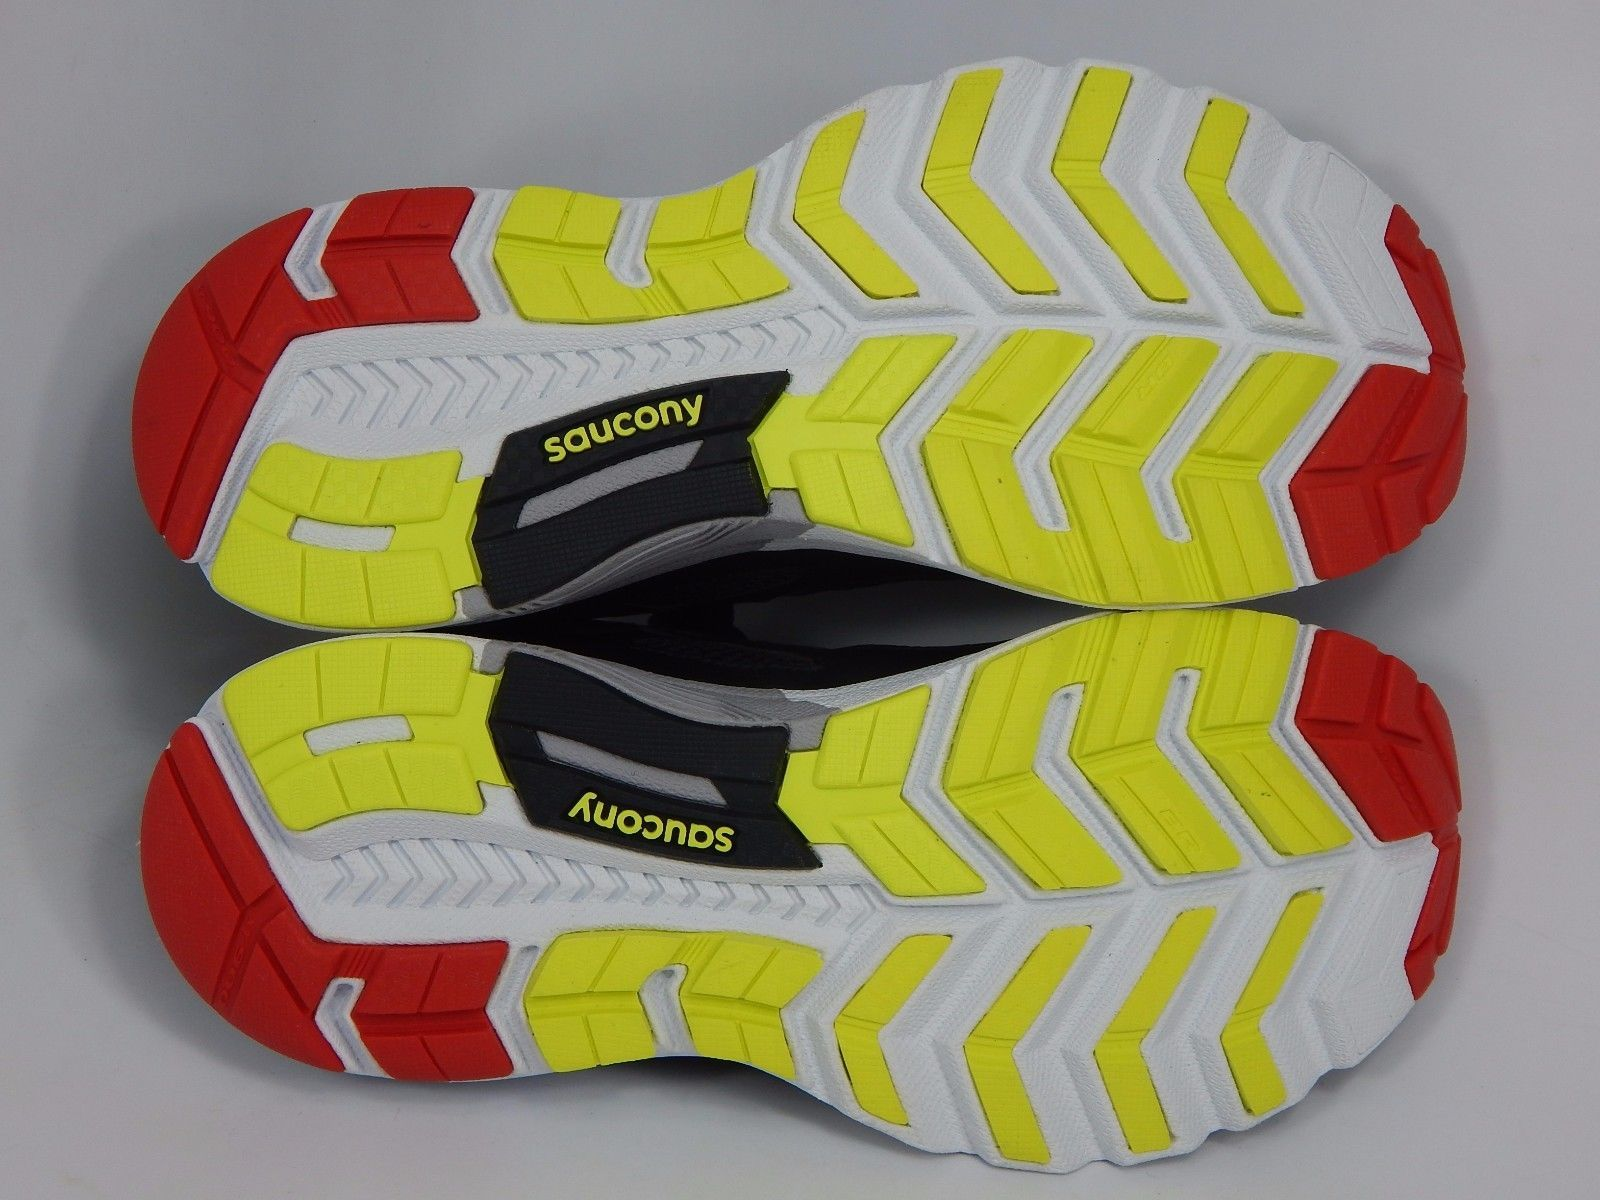 Saucony Valor Men's Running Shoes Size US 9 M (D) EU 42.5 Black Red S20321-2